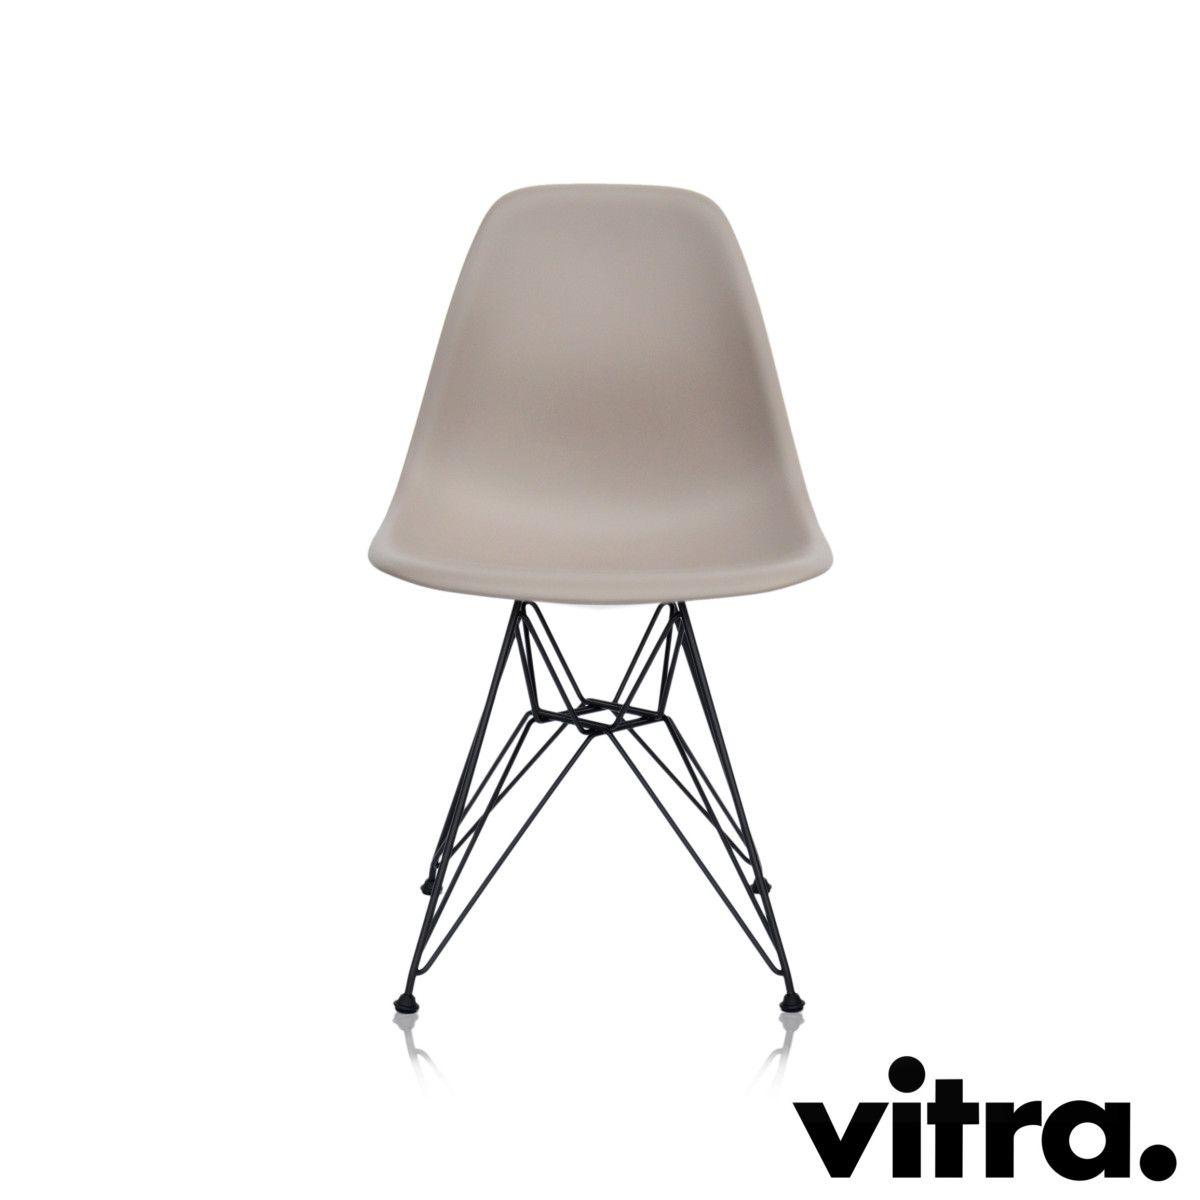 Vitra Eames Plastic Side Chair Dsr Kaufen Midmodern De Eames Wolle Kaufen Design